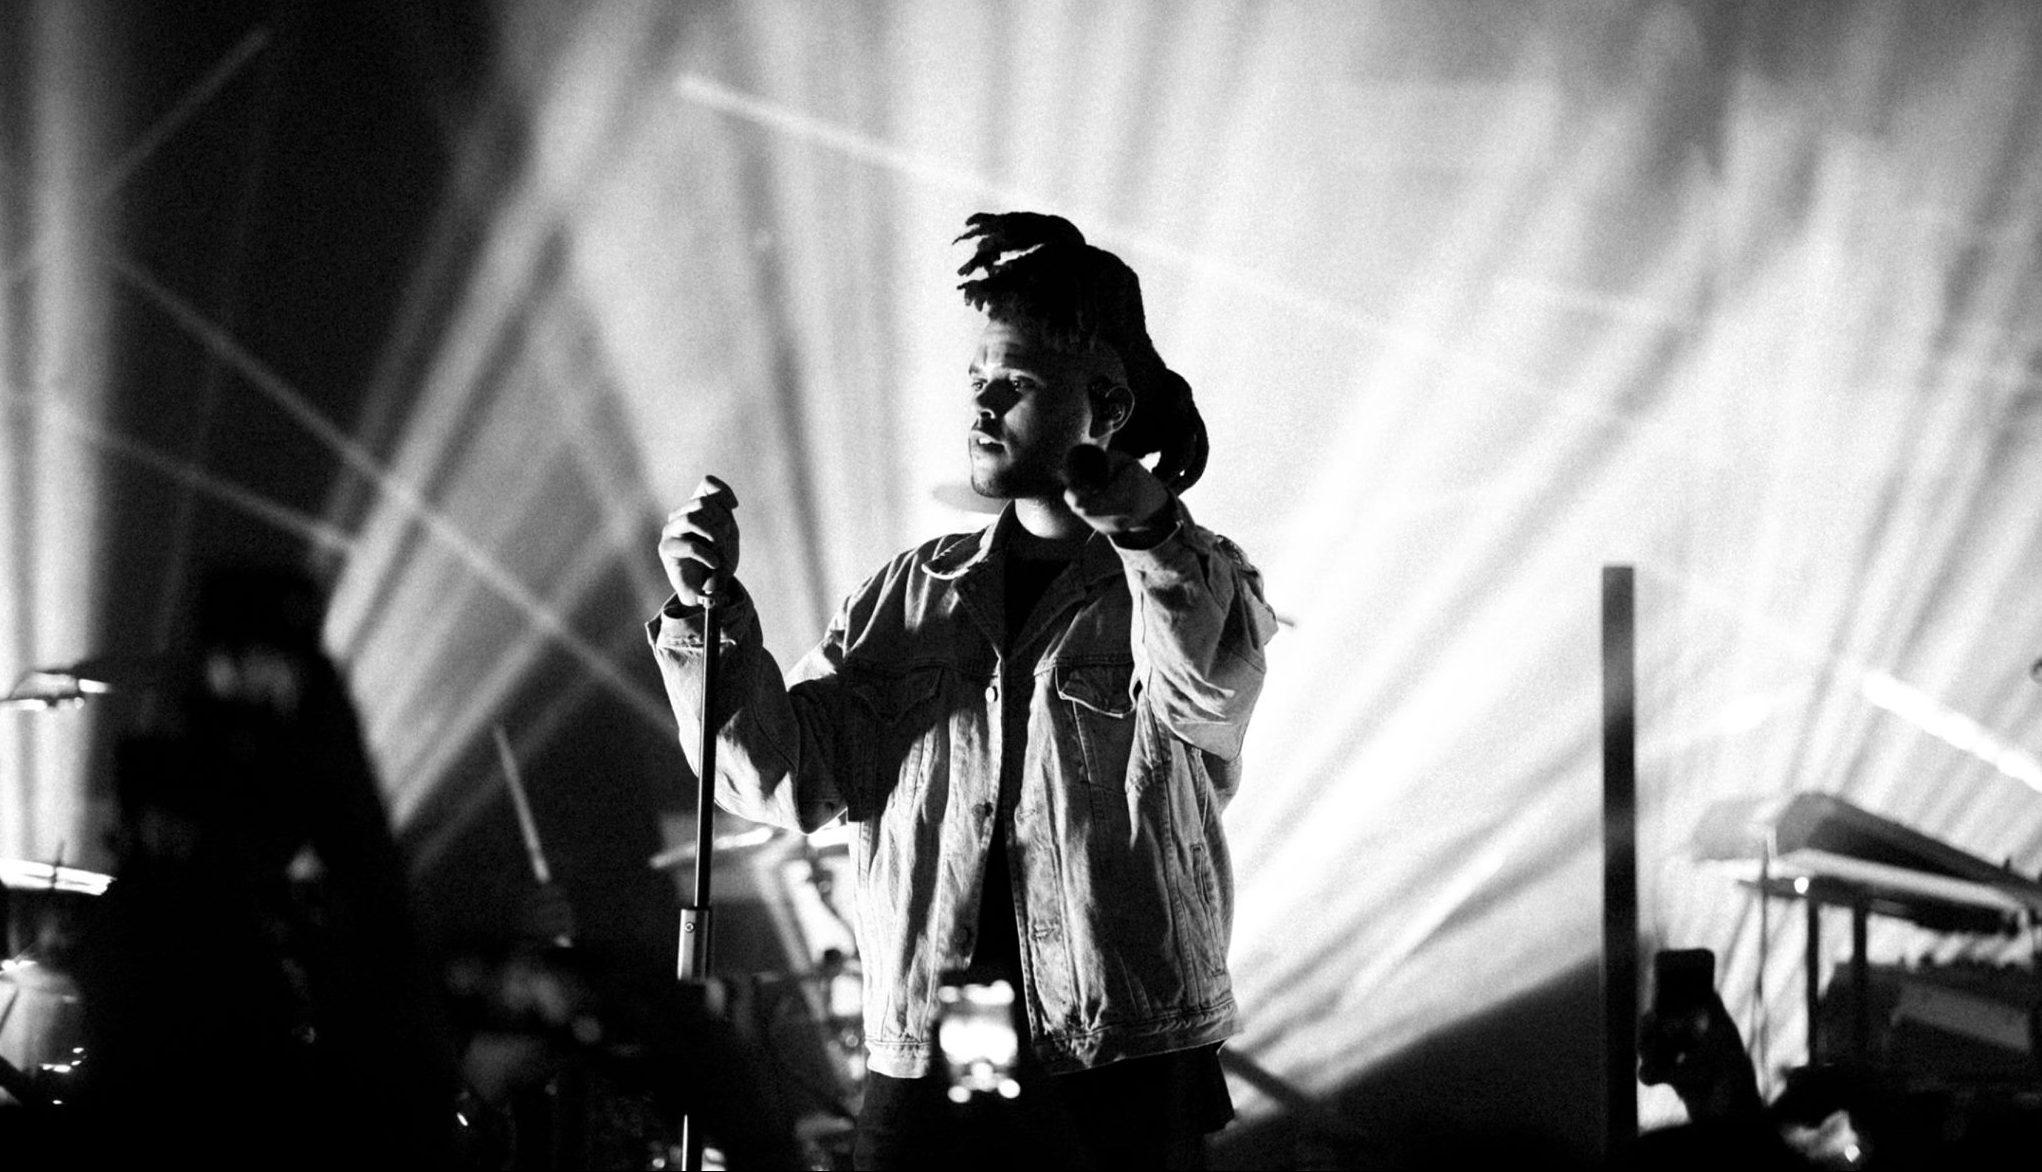 The Weeknd is headlining iHeartRadio Jingle Ball concert in Toronto